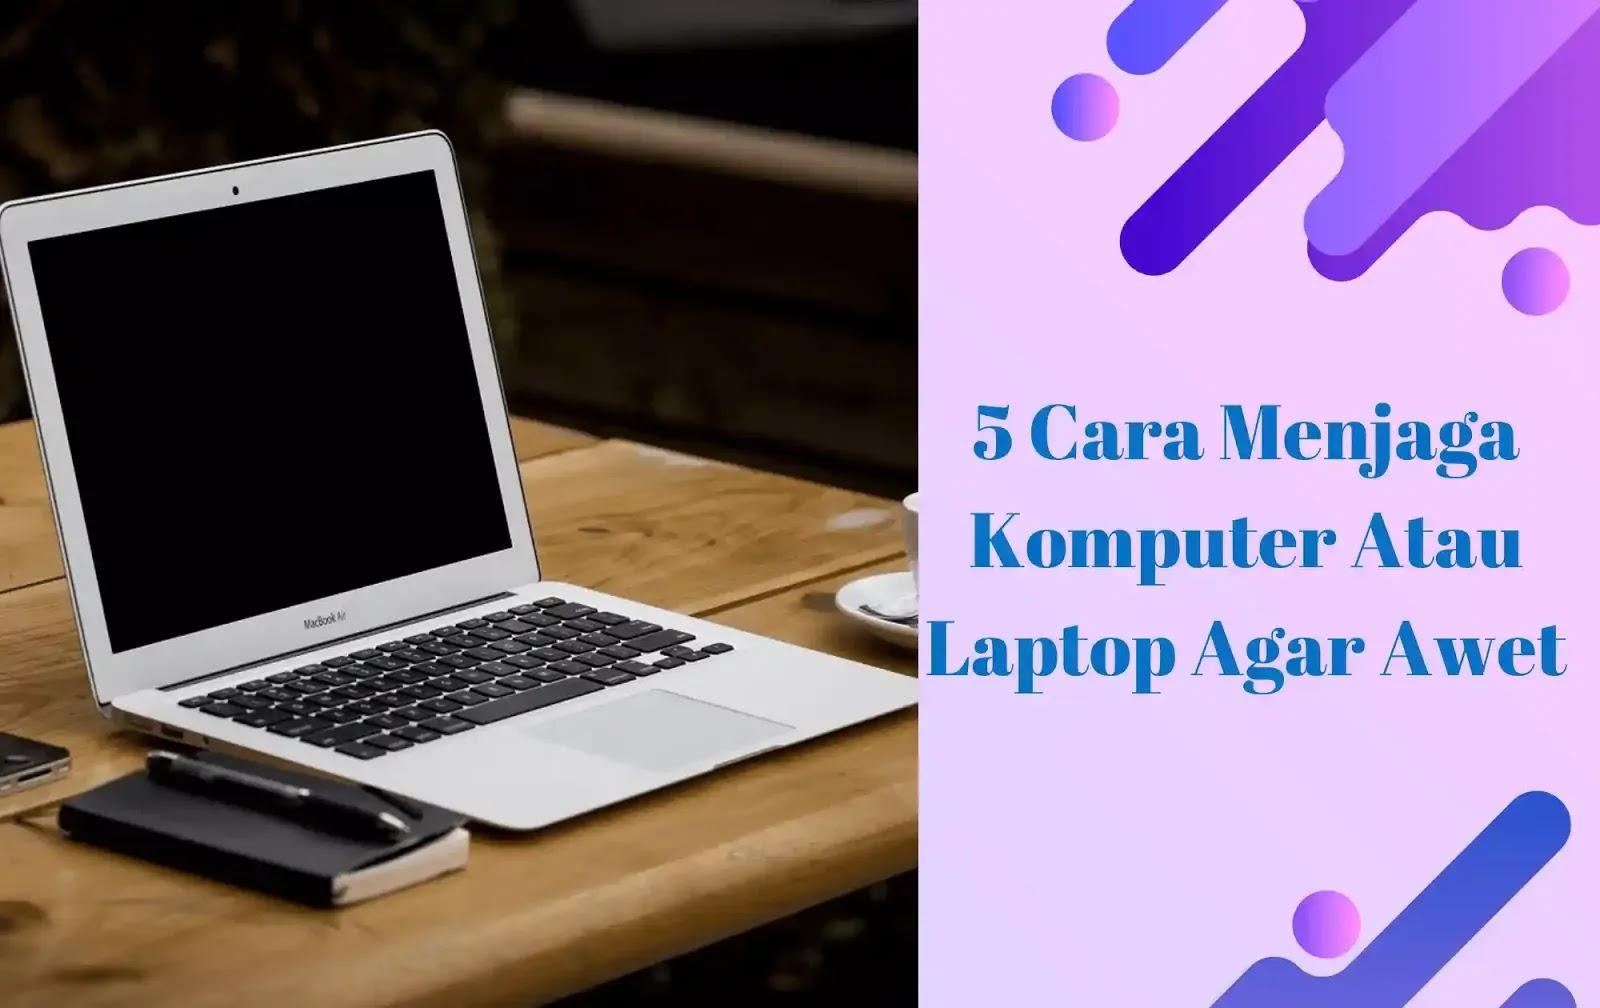 5 Cara Menjaga Komputer Atau Laptop Agar Awet